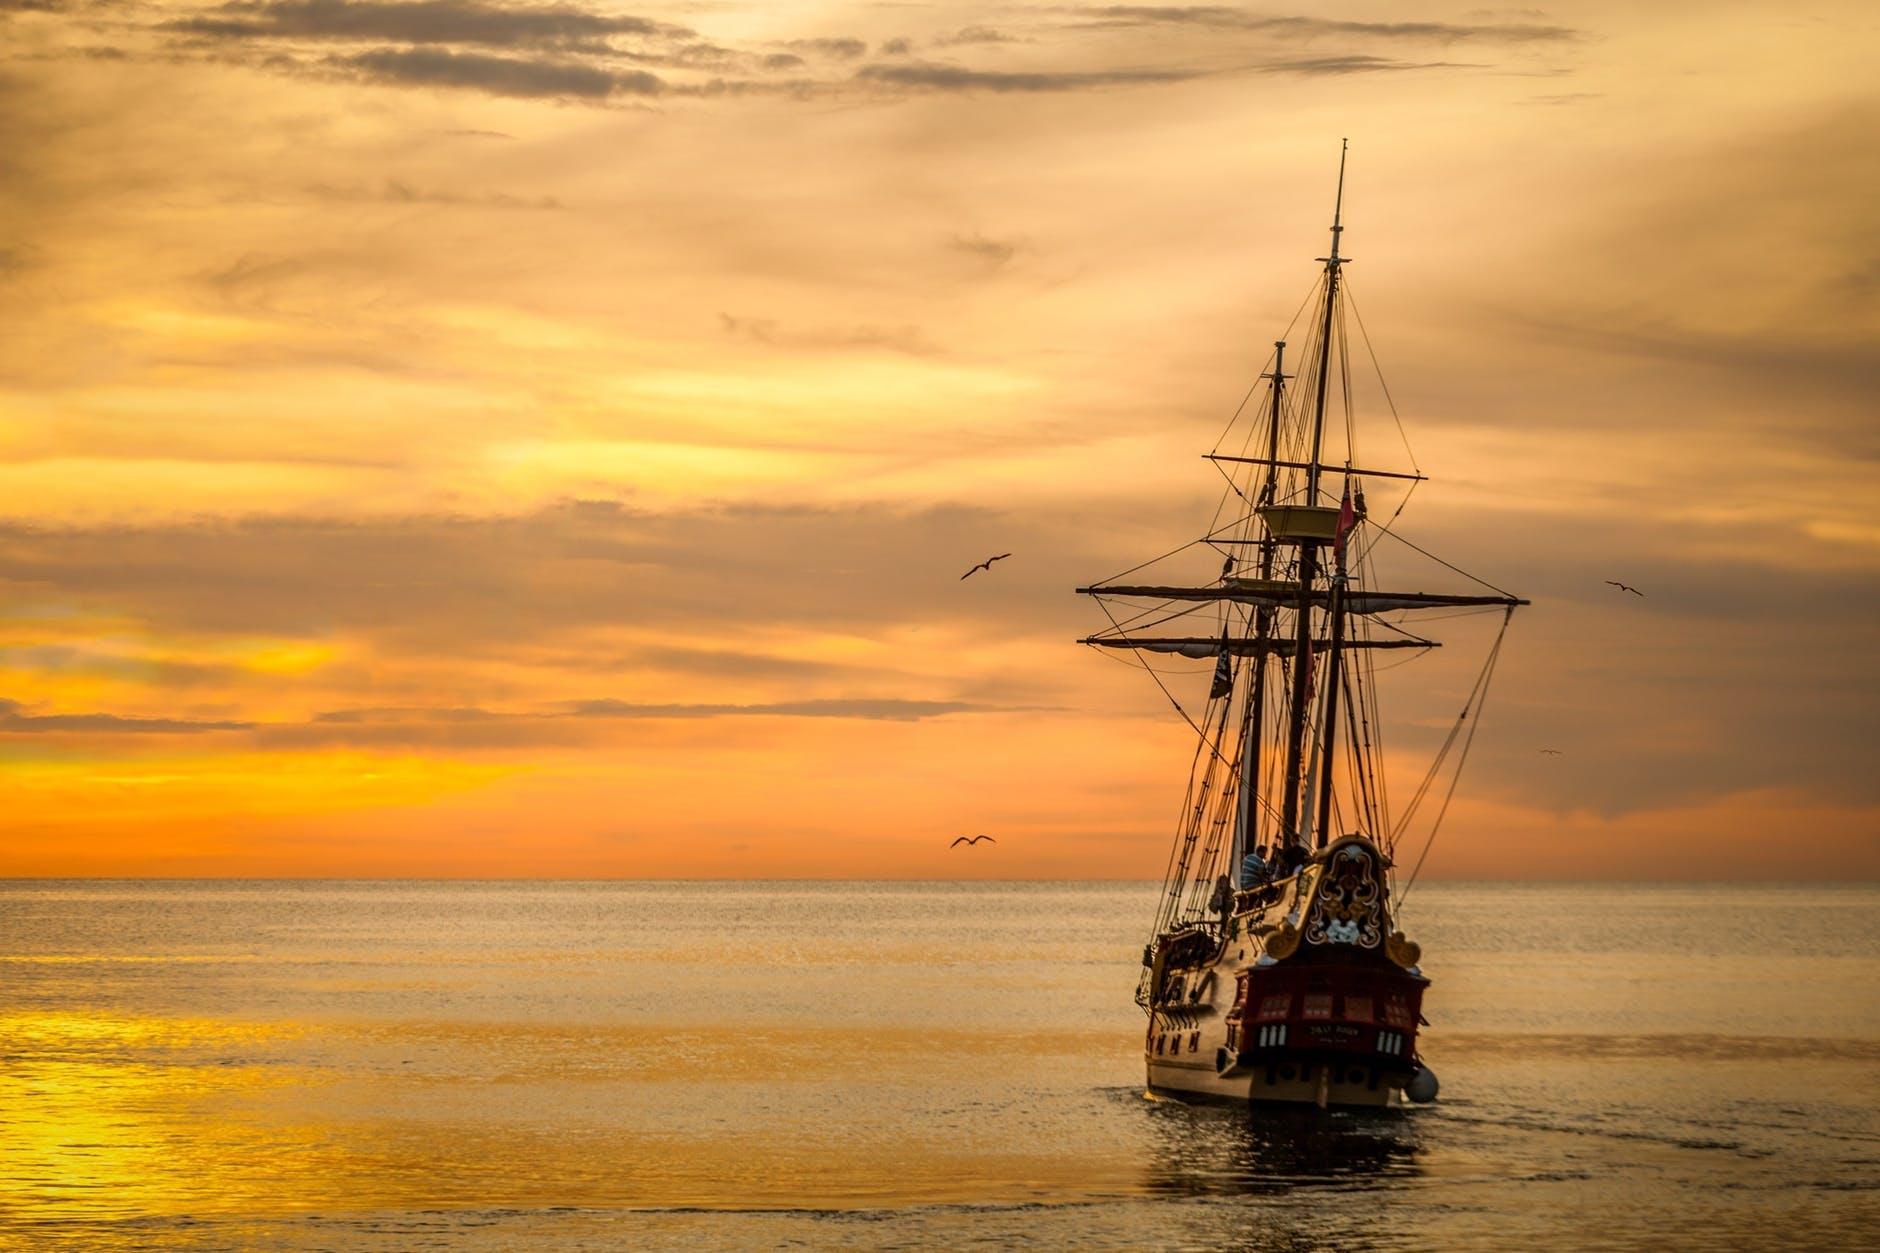 State-Sponsored Piracy? The Allen v. Cooper Case